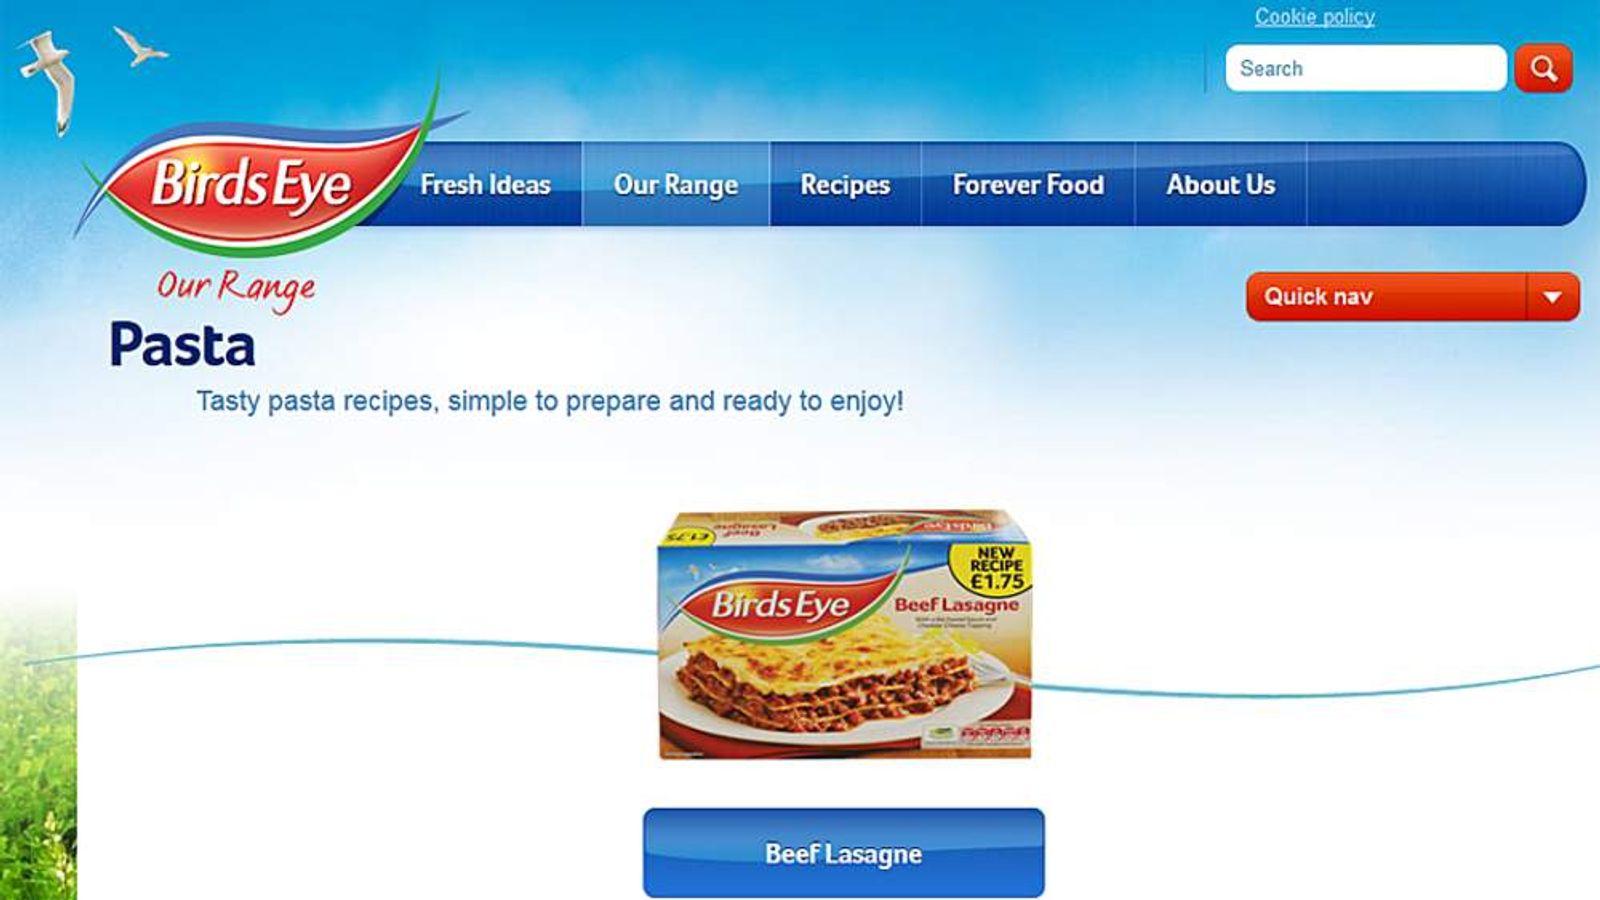 Birds Eye beef lasagne on its website